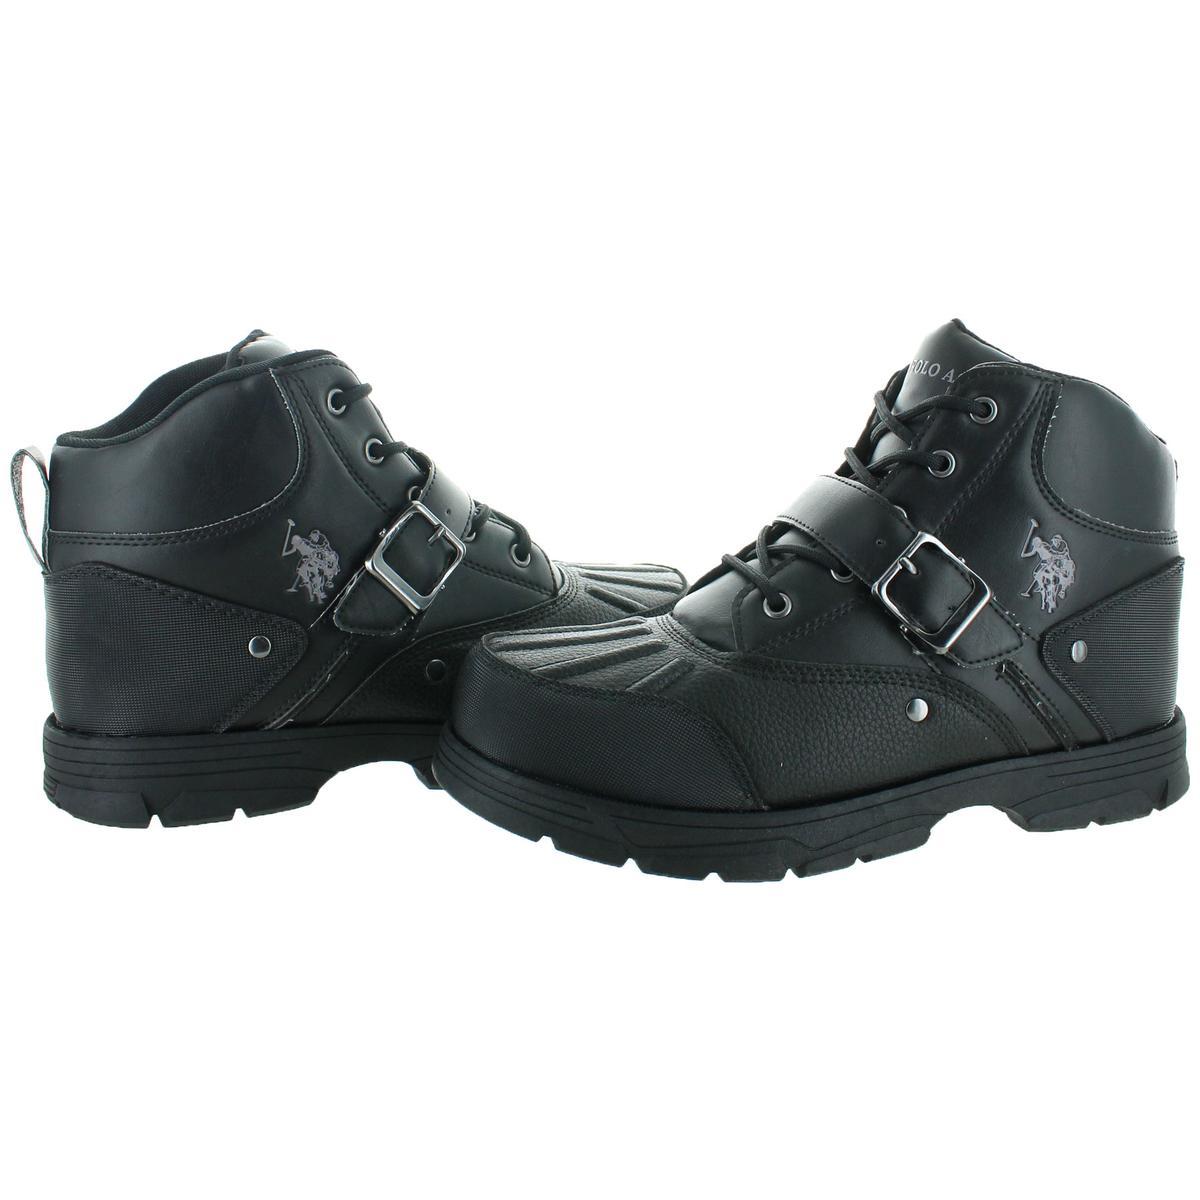 U-S-Polo-Assn-Kedge-Men-039-s-Buckle-Duck-Toe-Winter-Snow-Boots thumbnail 4